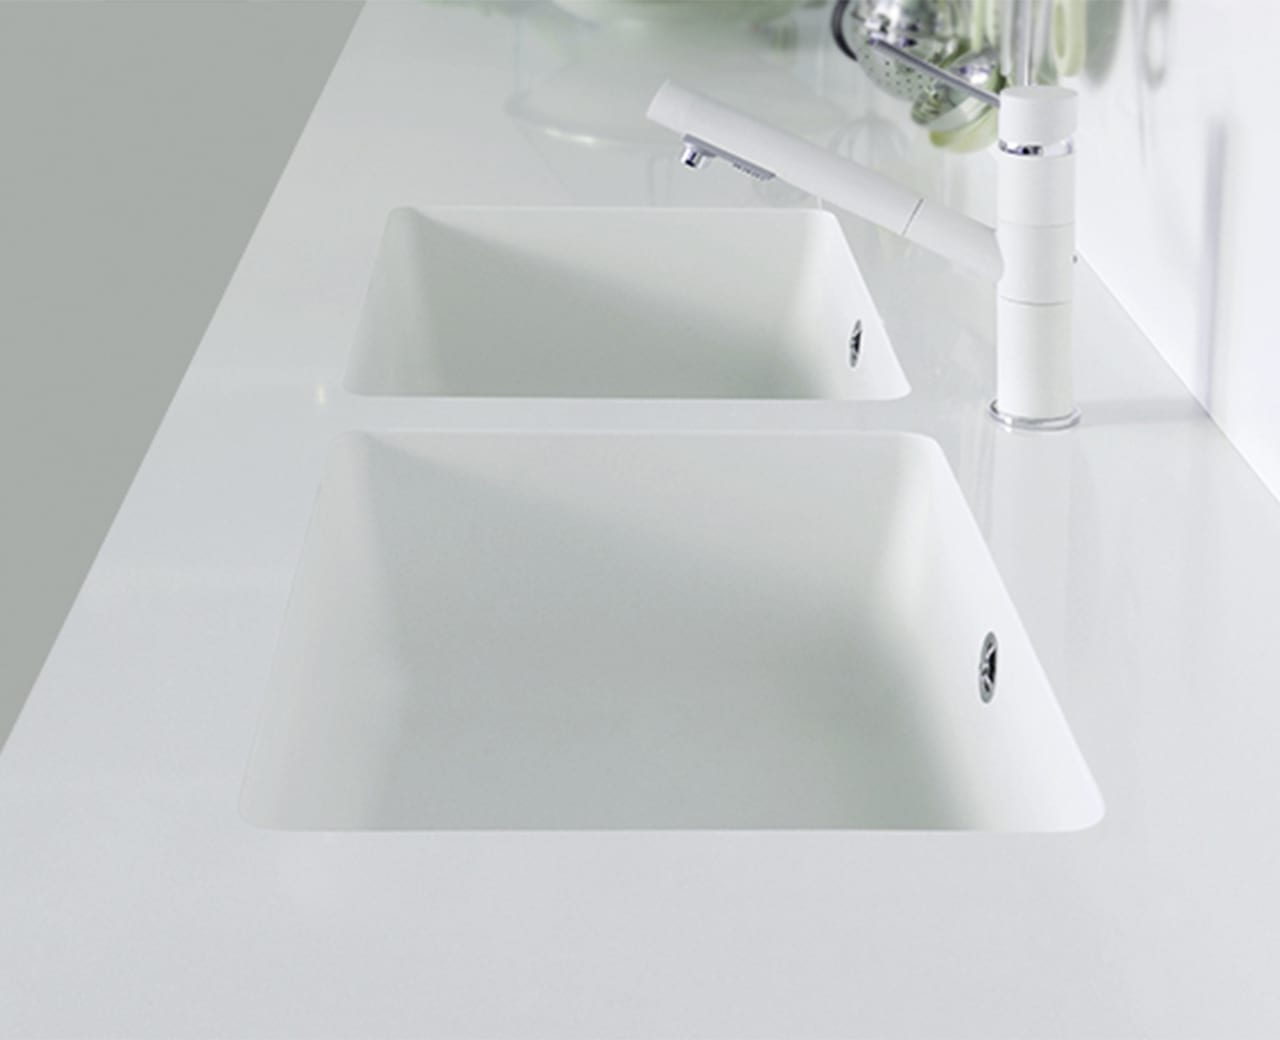 Quartz Sinks: Everything You Need to Know | QualityBath com